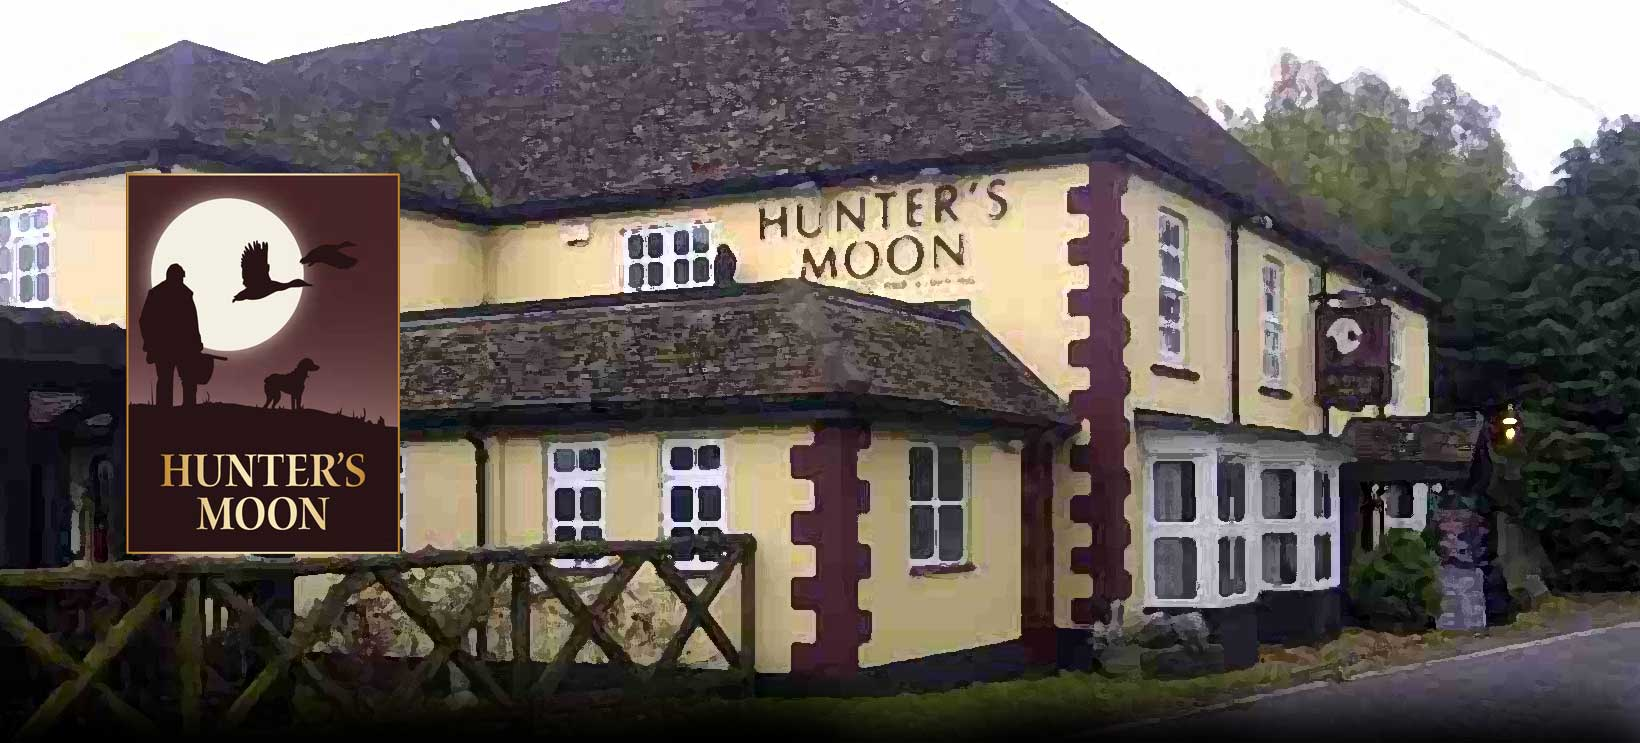 hunters moon middlemarsh